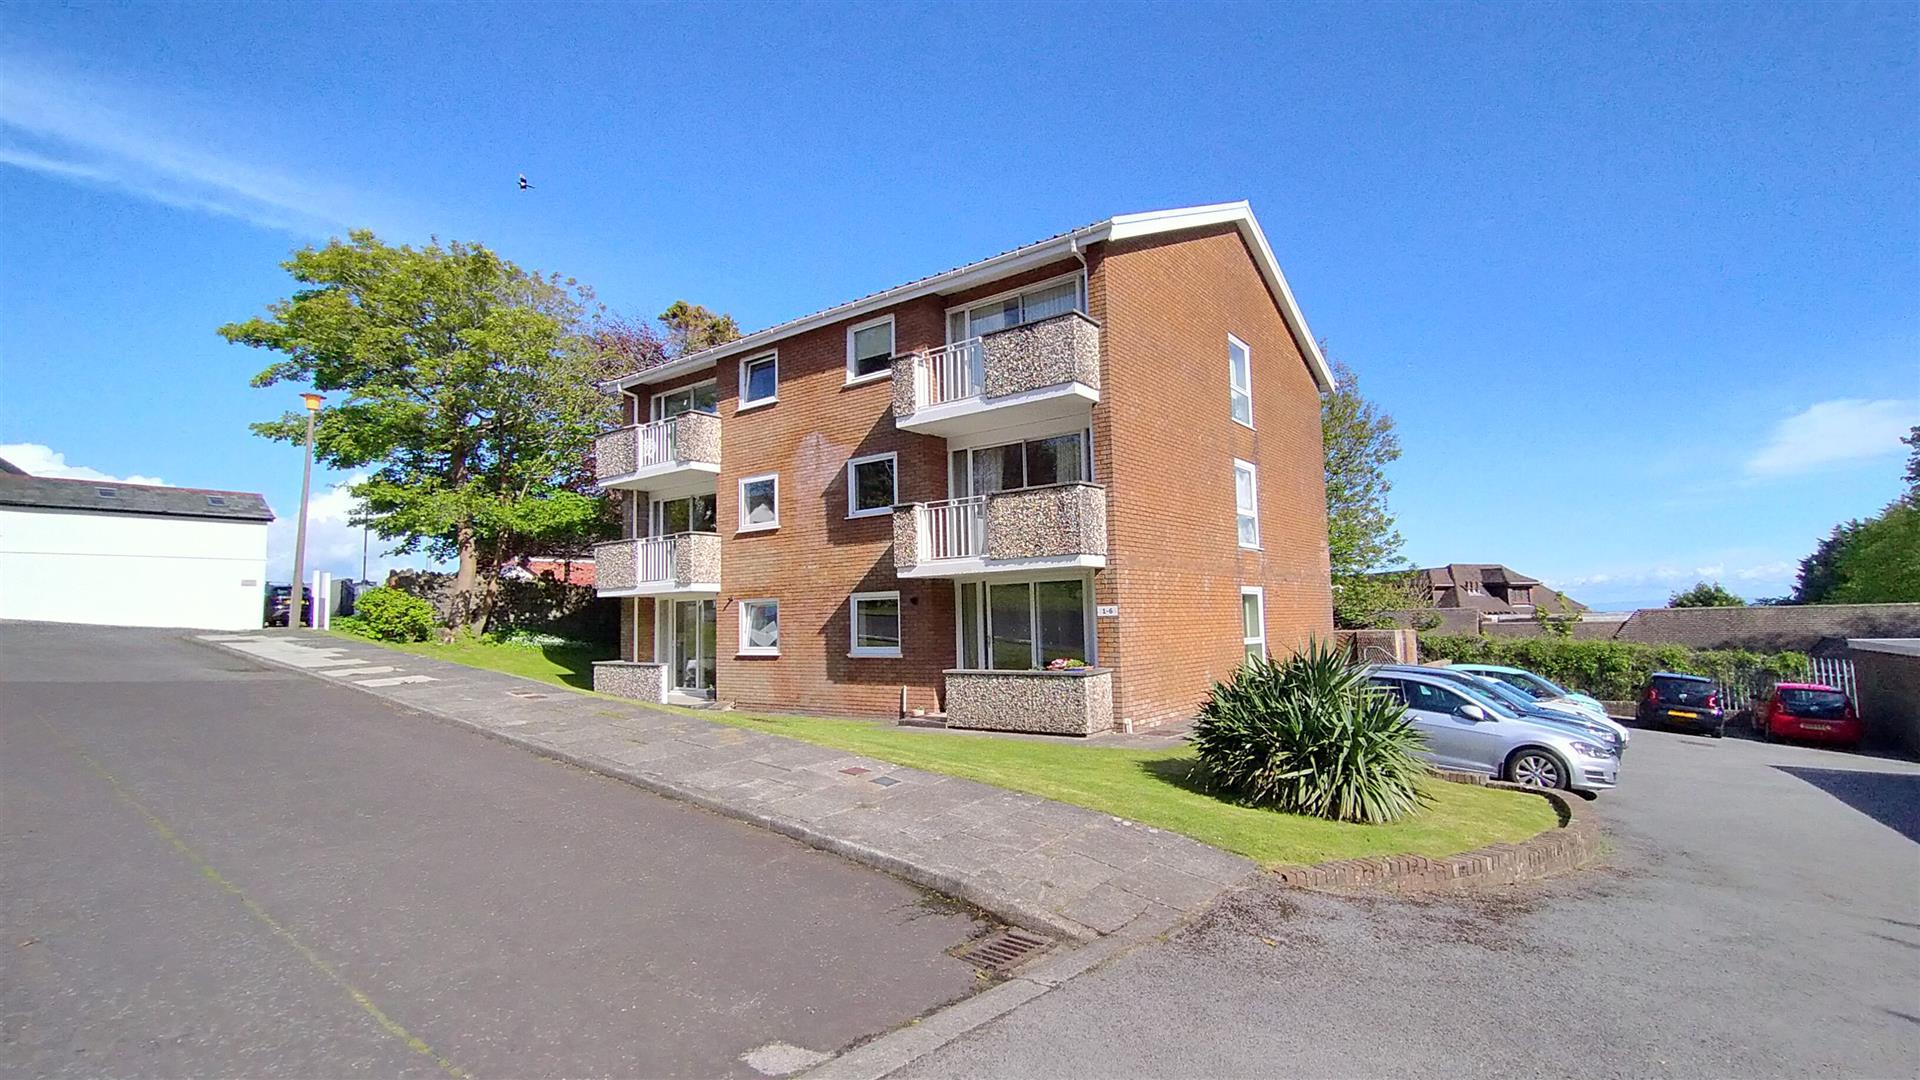 Groves Avenue, Langland, Mumbles, Swansea, SA3 4QX